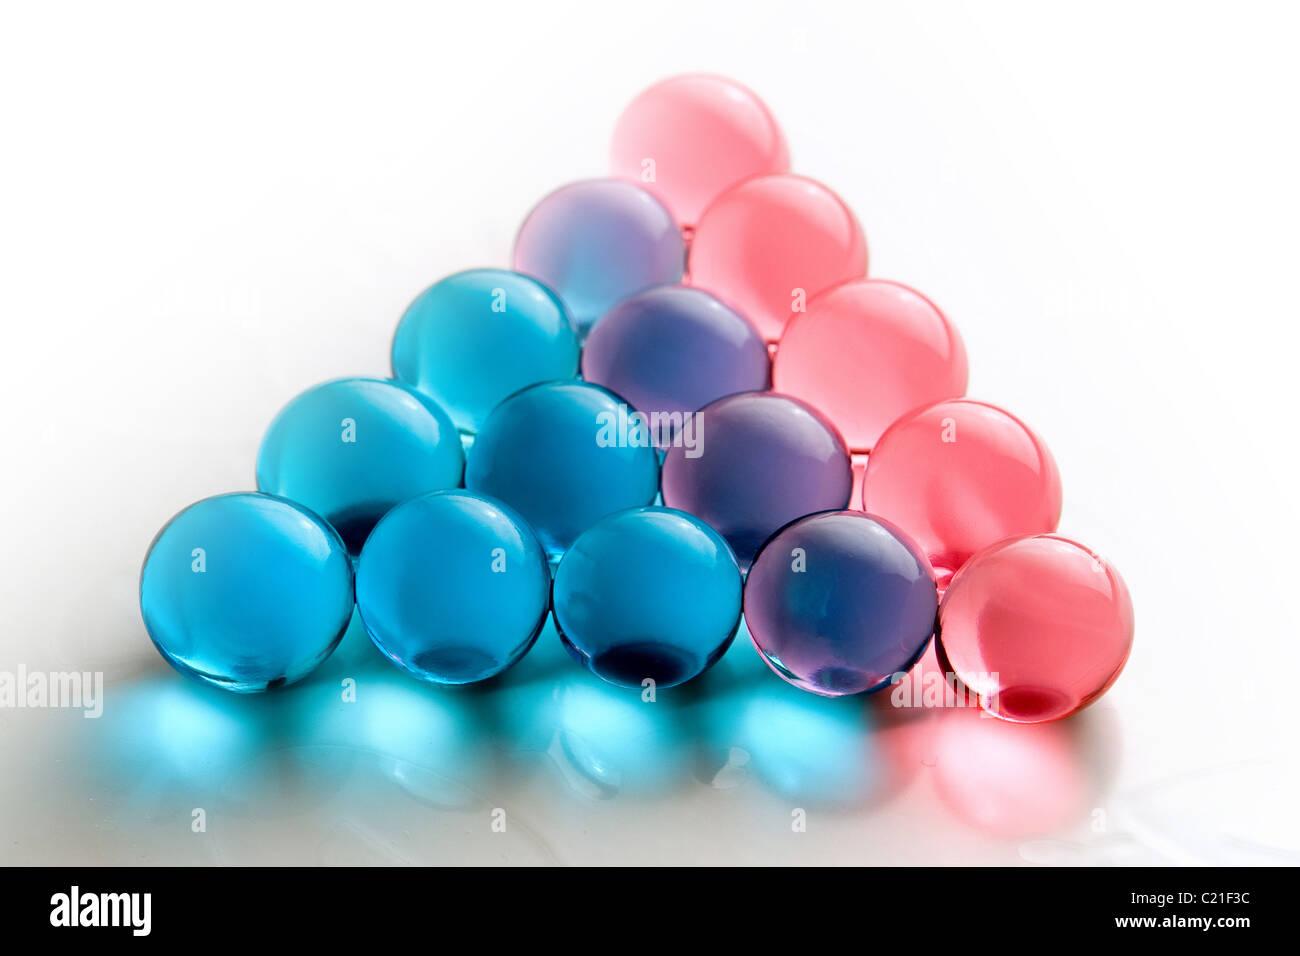 Batch of transparent gel balls, spa accessories - Stock Image